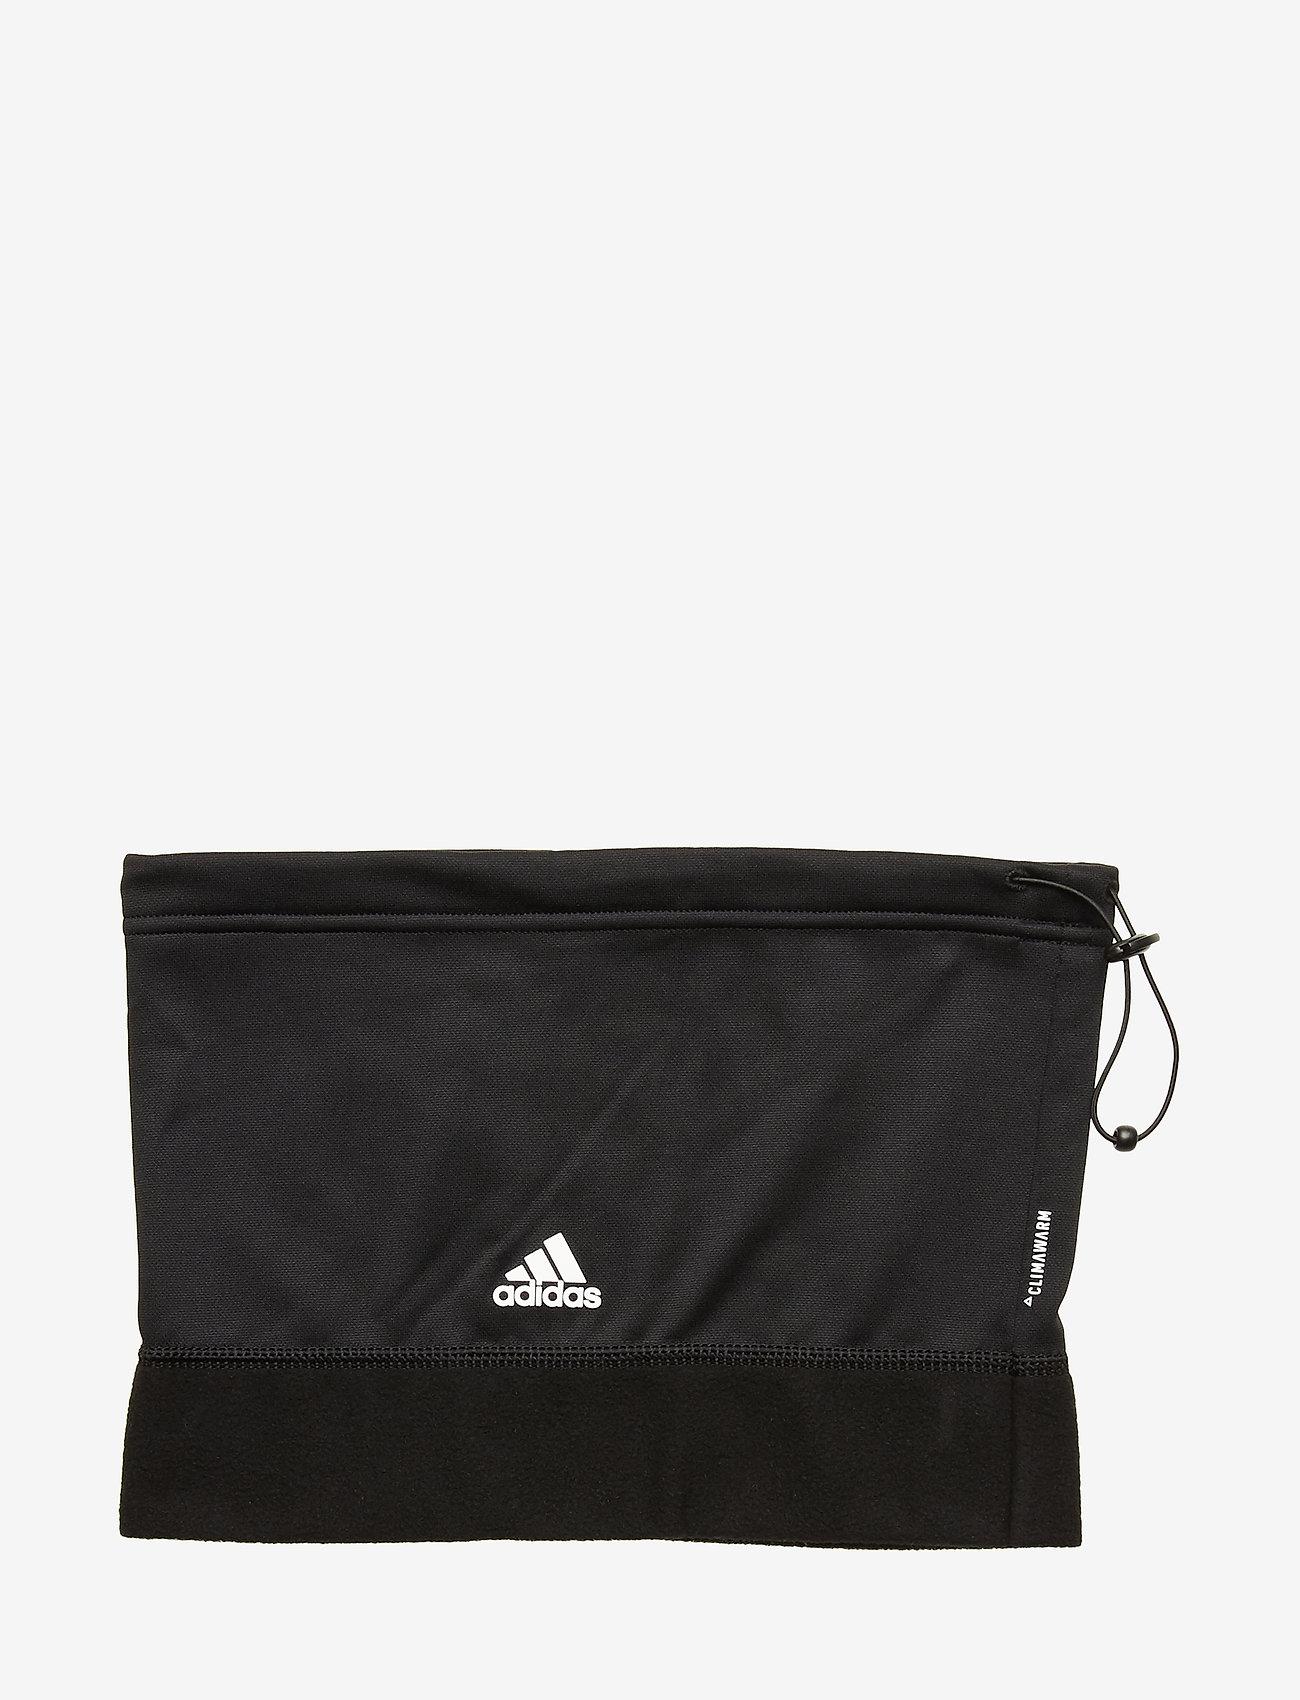 adidas Performance TIRO NECKWARMER - Szaliki i chusty BLACK/WHITE - Akcesoria